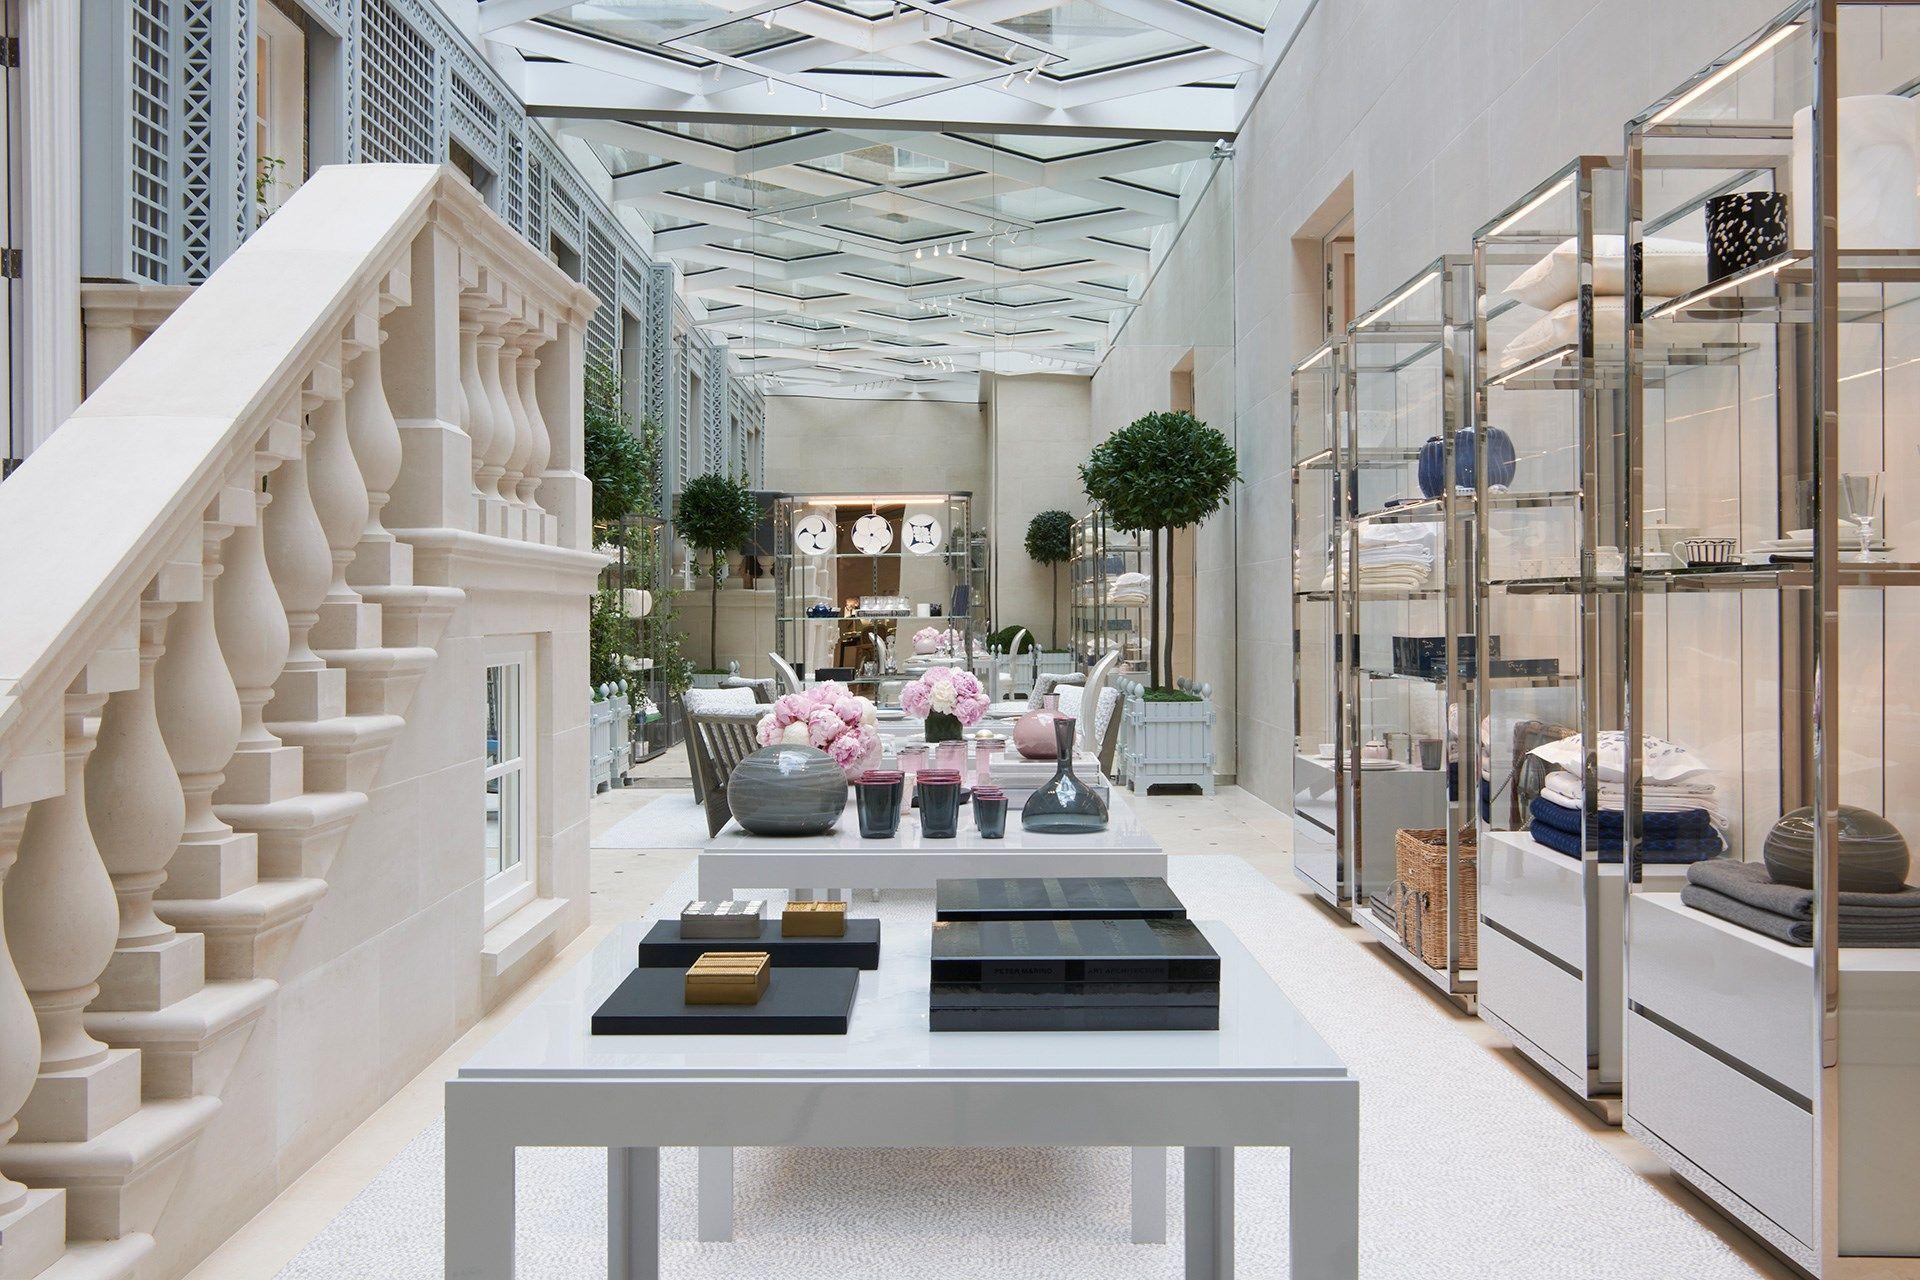 Dior s Bond Street London- A New Opening   For home   Boutique ... 8c9e23e12e7